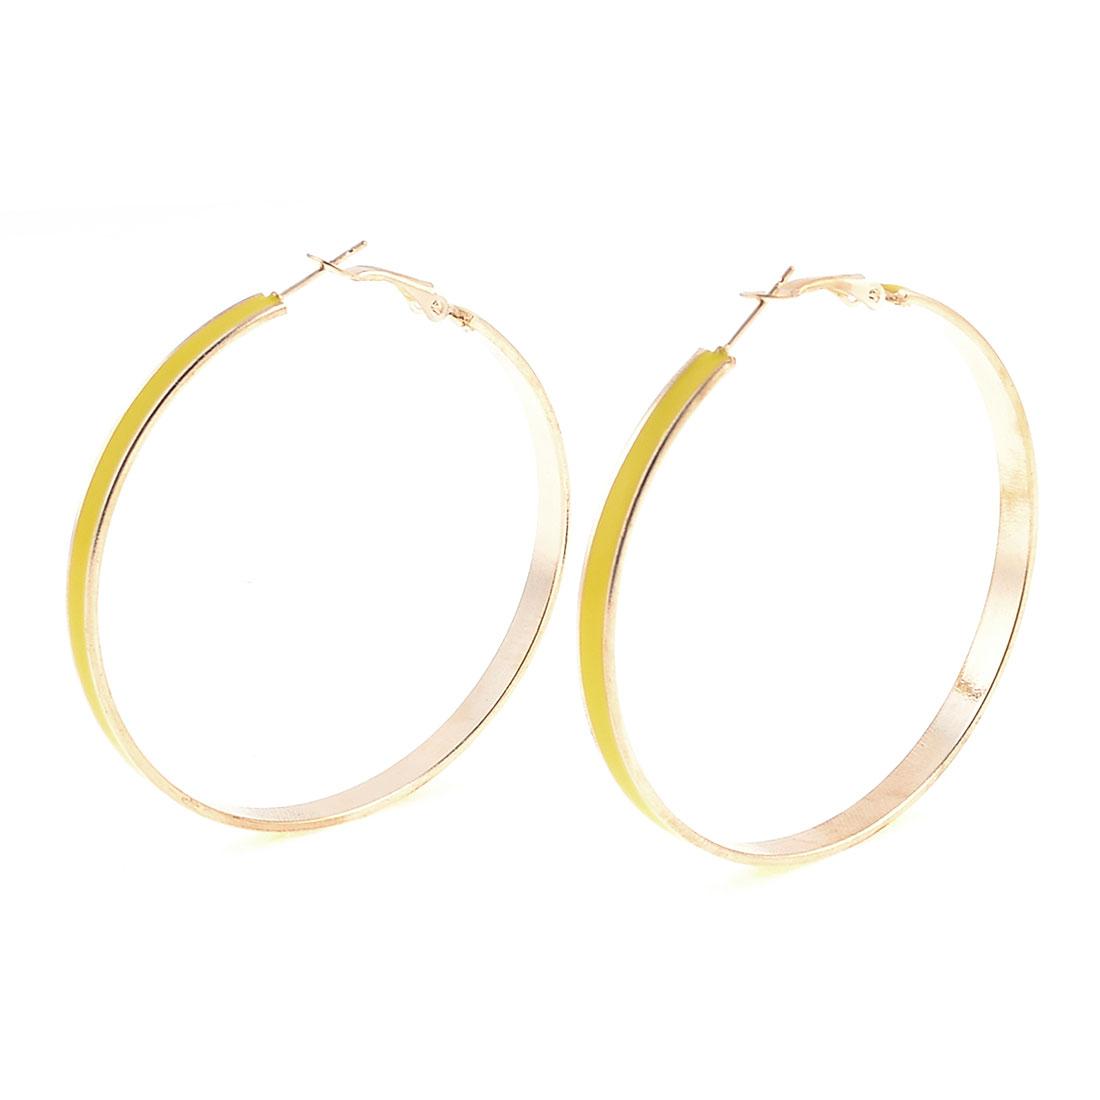 Yellow Gold Tone Metal Round Hoop Dangler Earrings Pair for Women